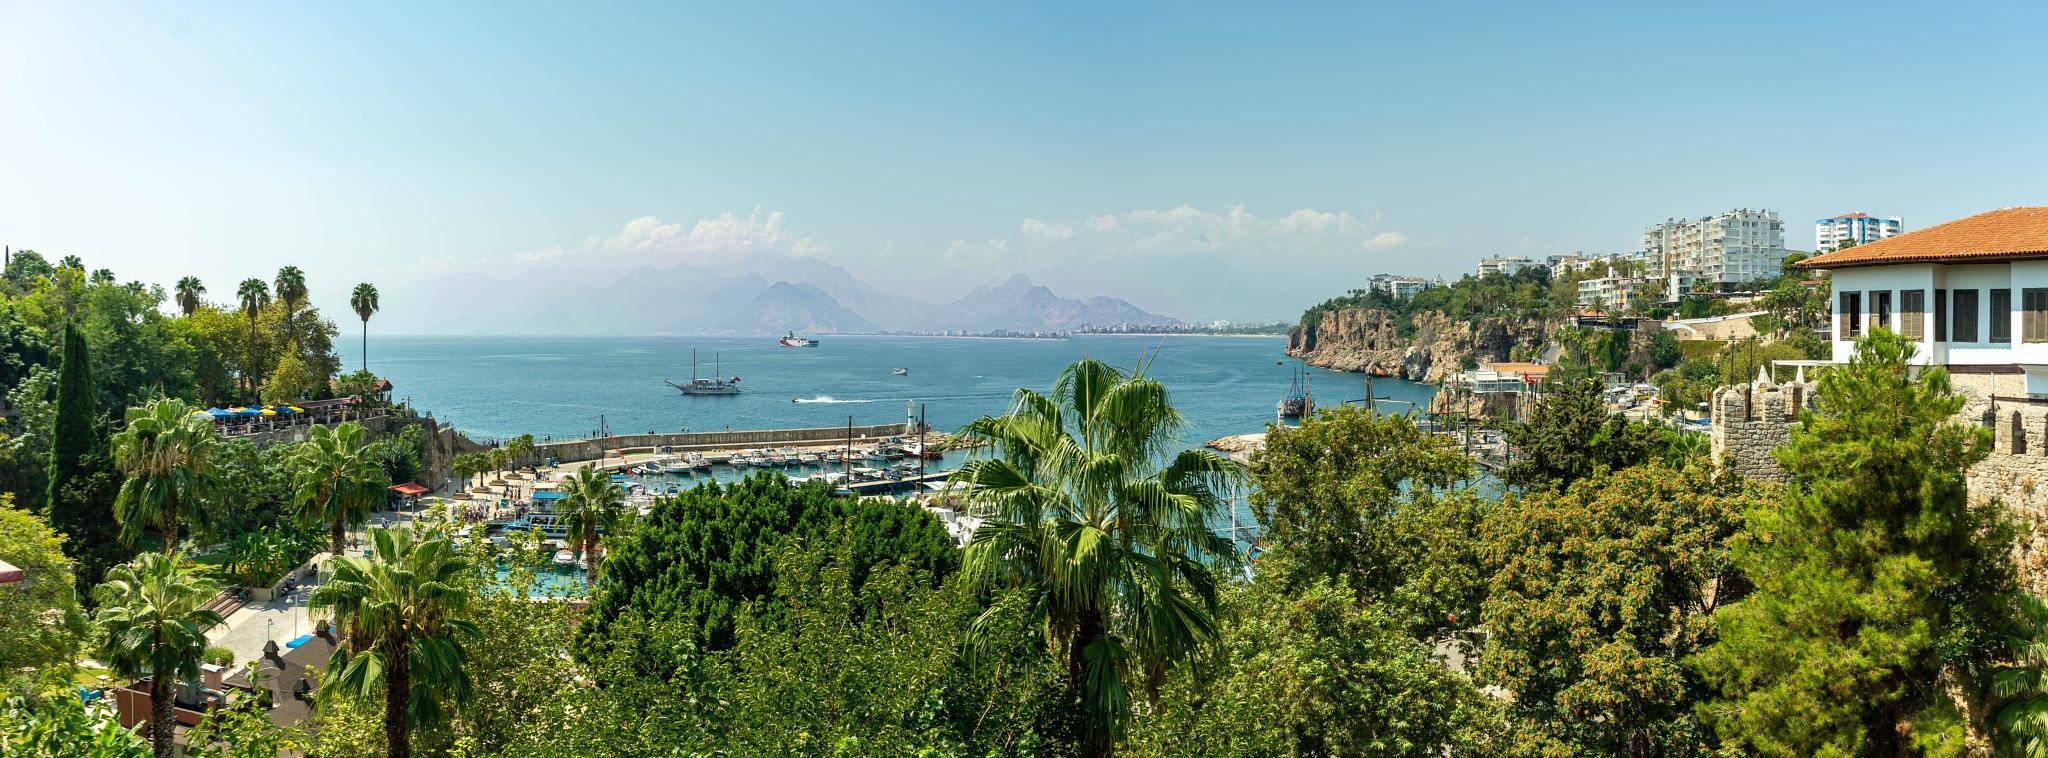 Turkey Antalya by Raimis007